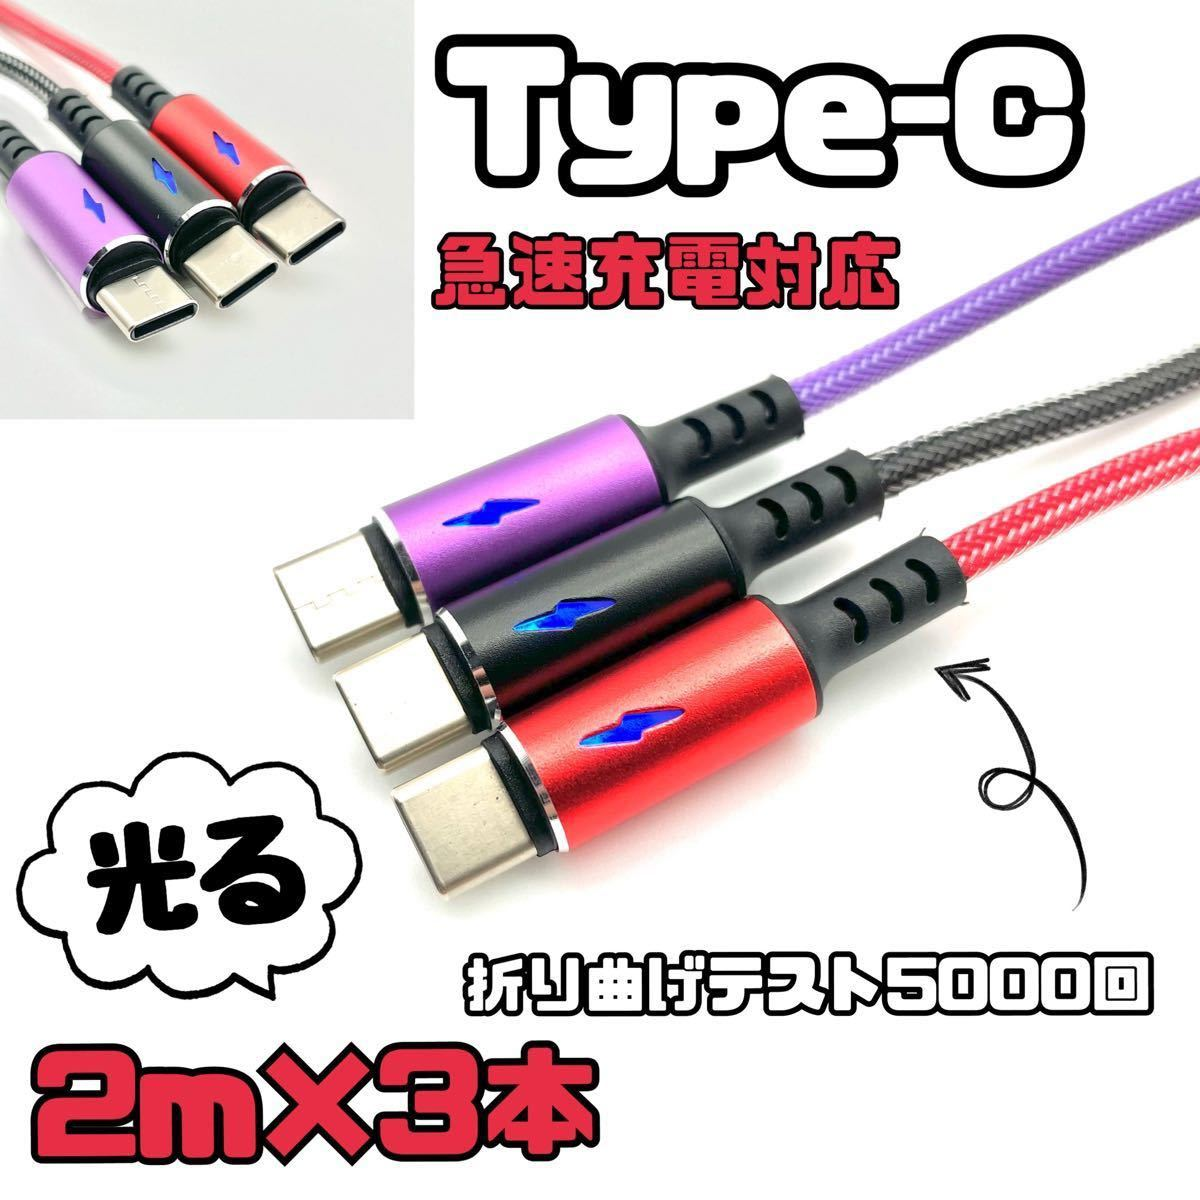 type-c 3.0A急速充電対応 ケーブル2m 3本セット